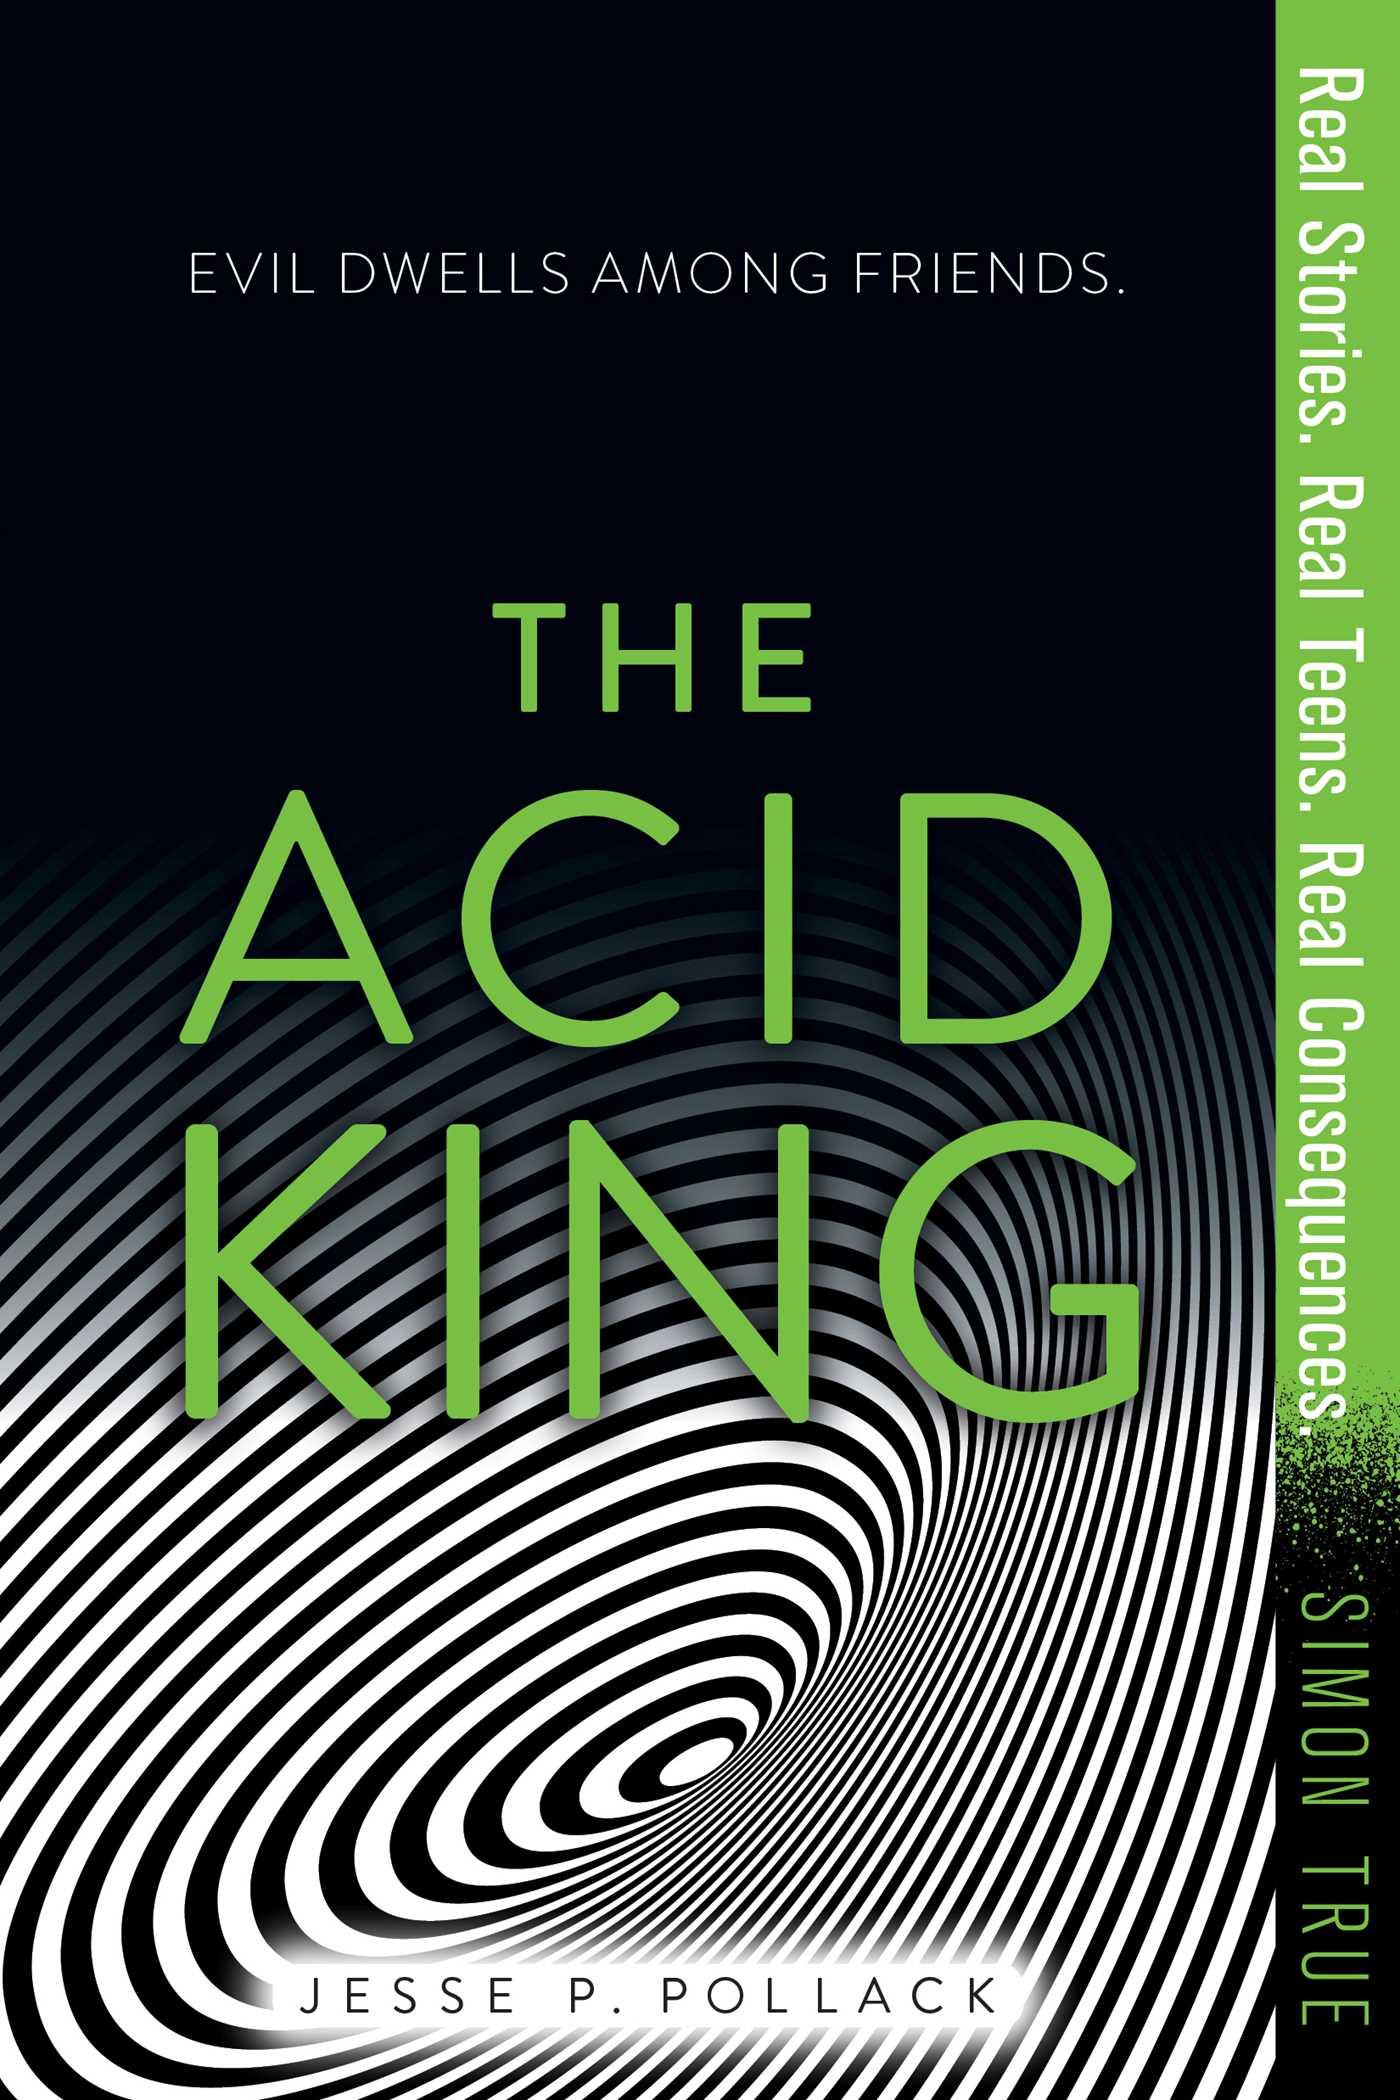 The acid king 9781481482288 hr